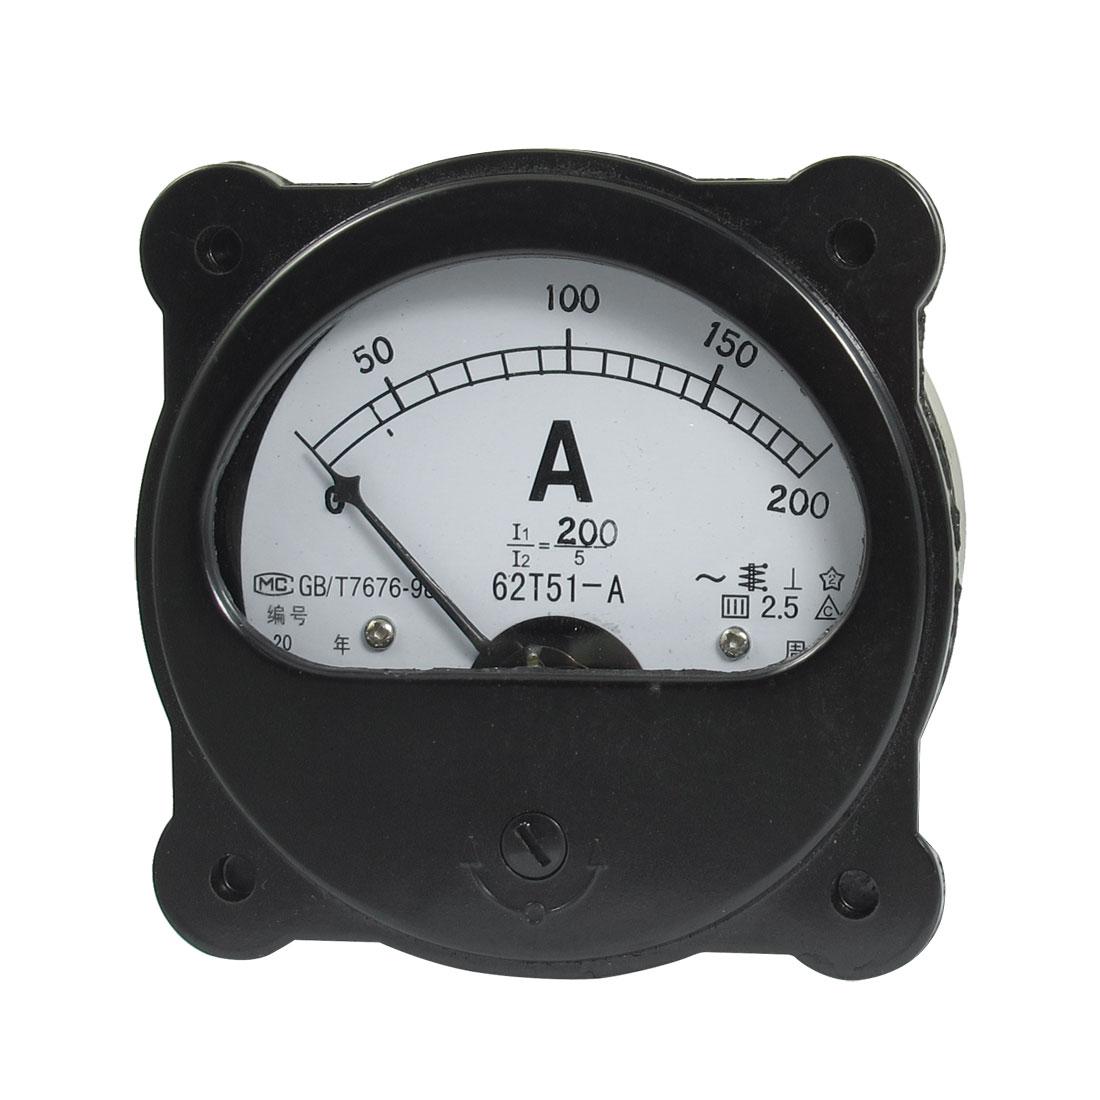 Class 2.5 AC 0-200A Screw Mounted Amperemeter Panel Meter Gauge Black